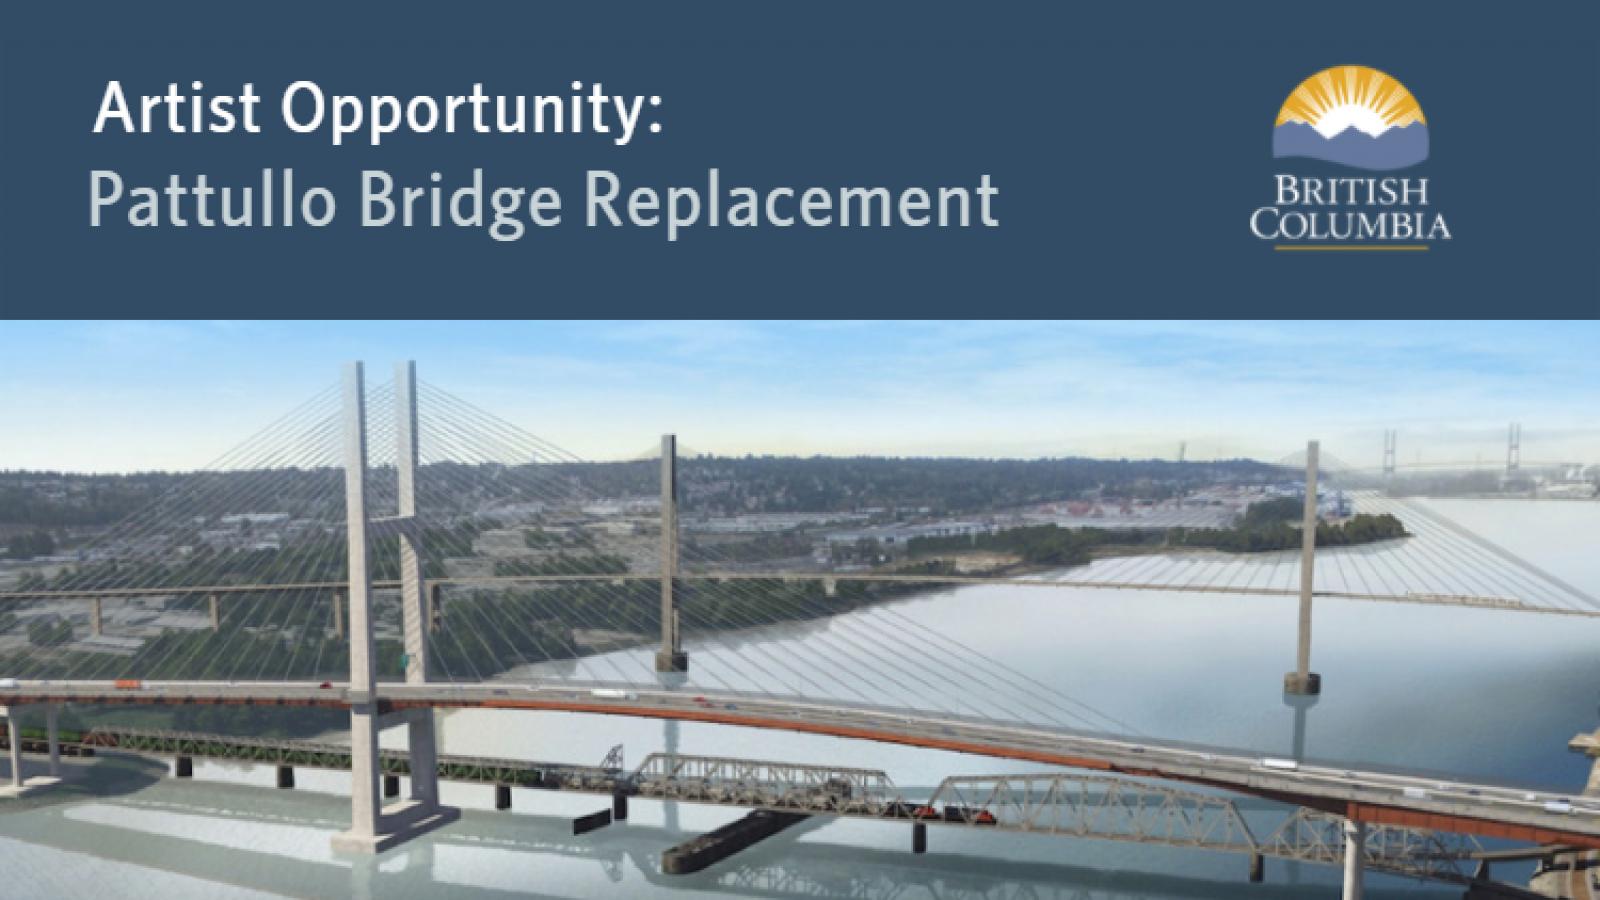 Musqueam Artist Opportunity: Pattullo Bridge Replacement